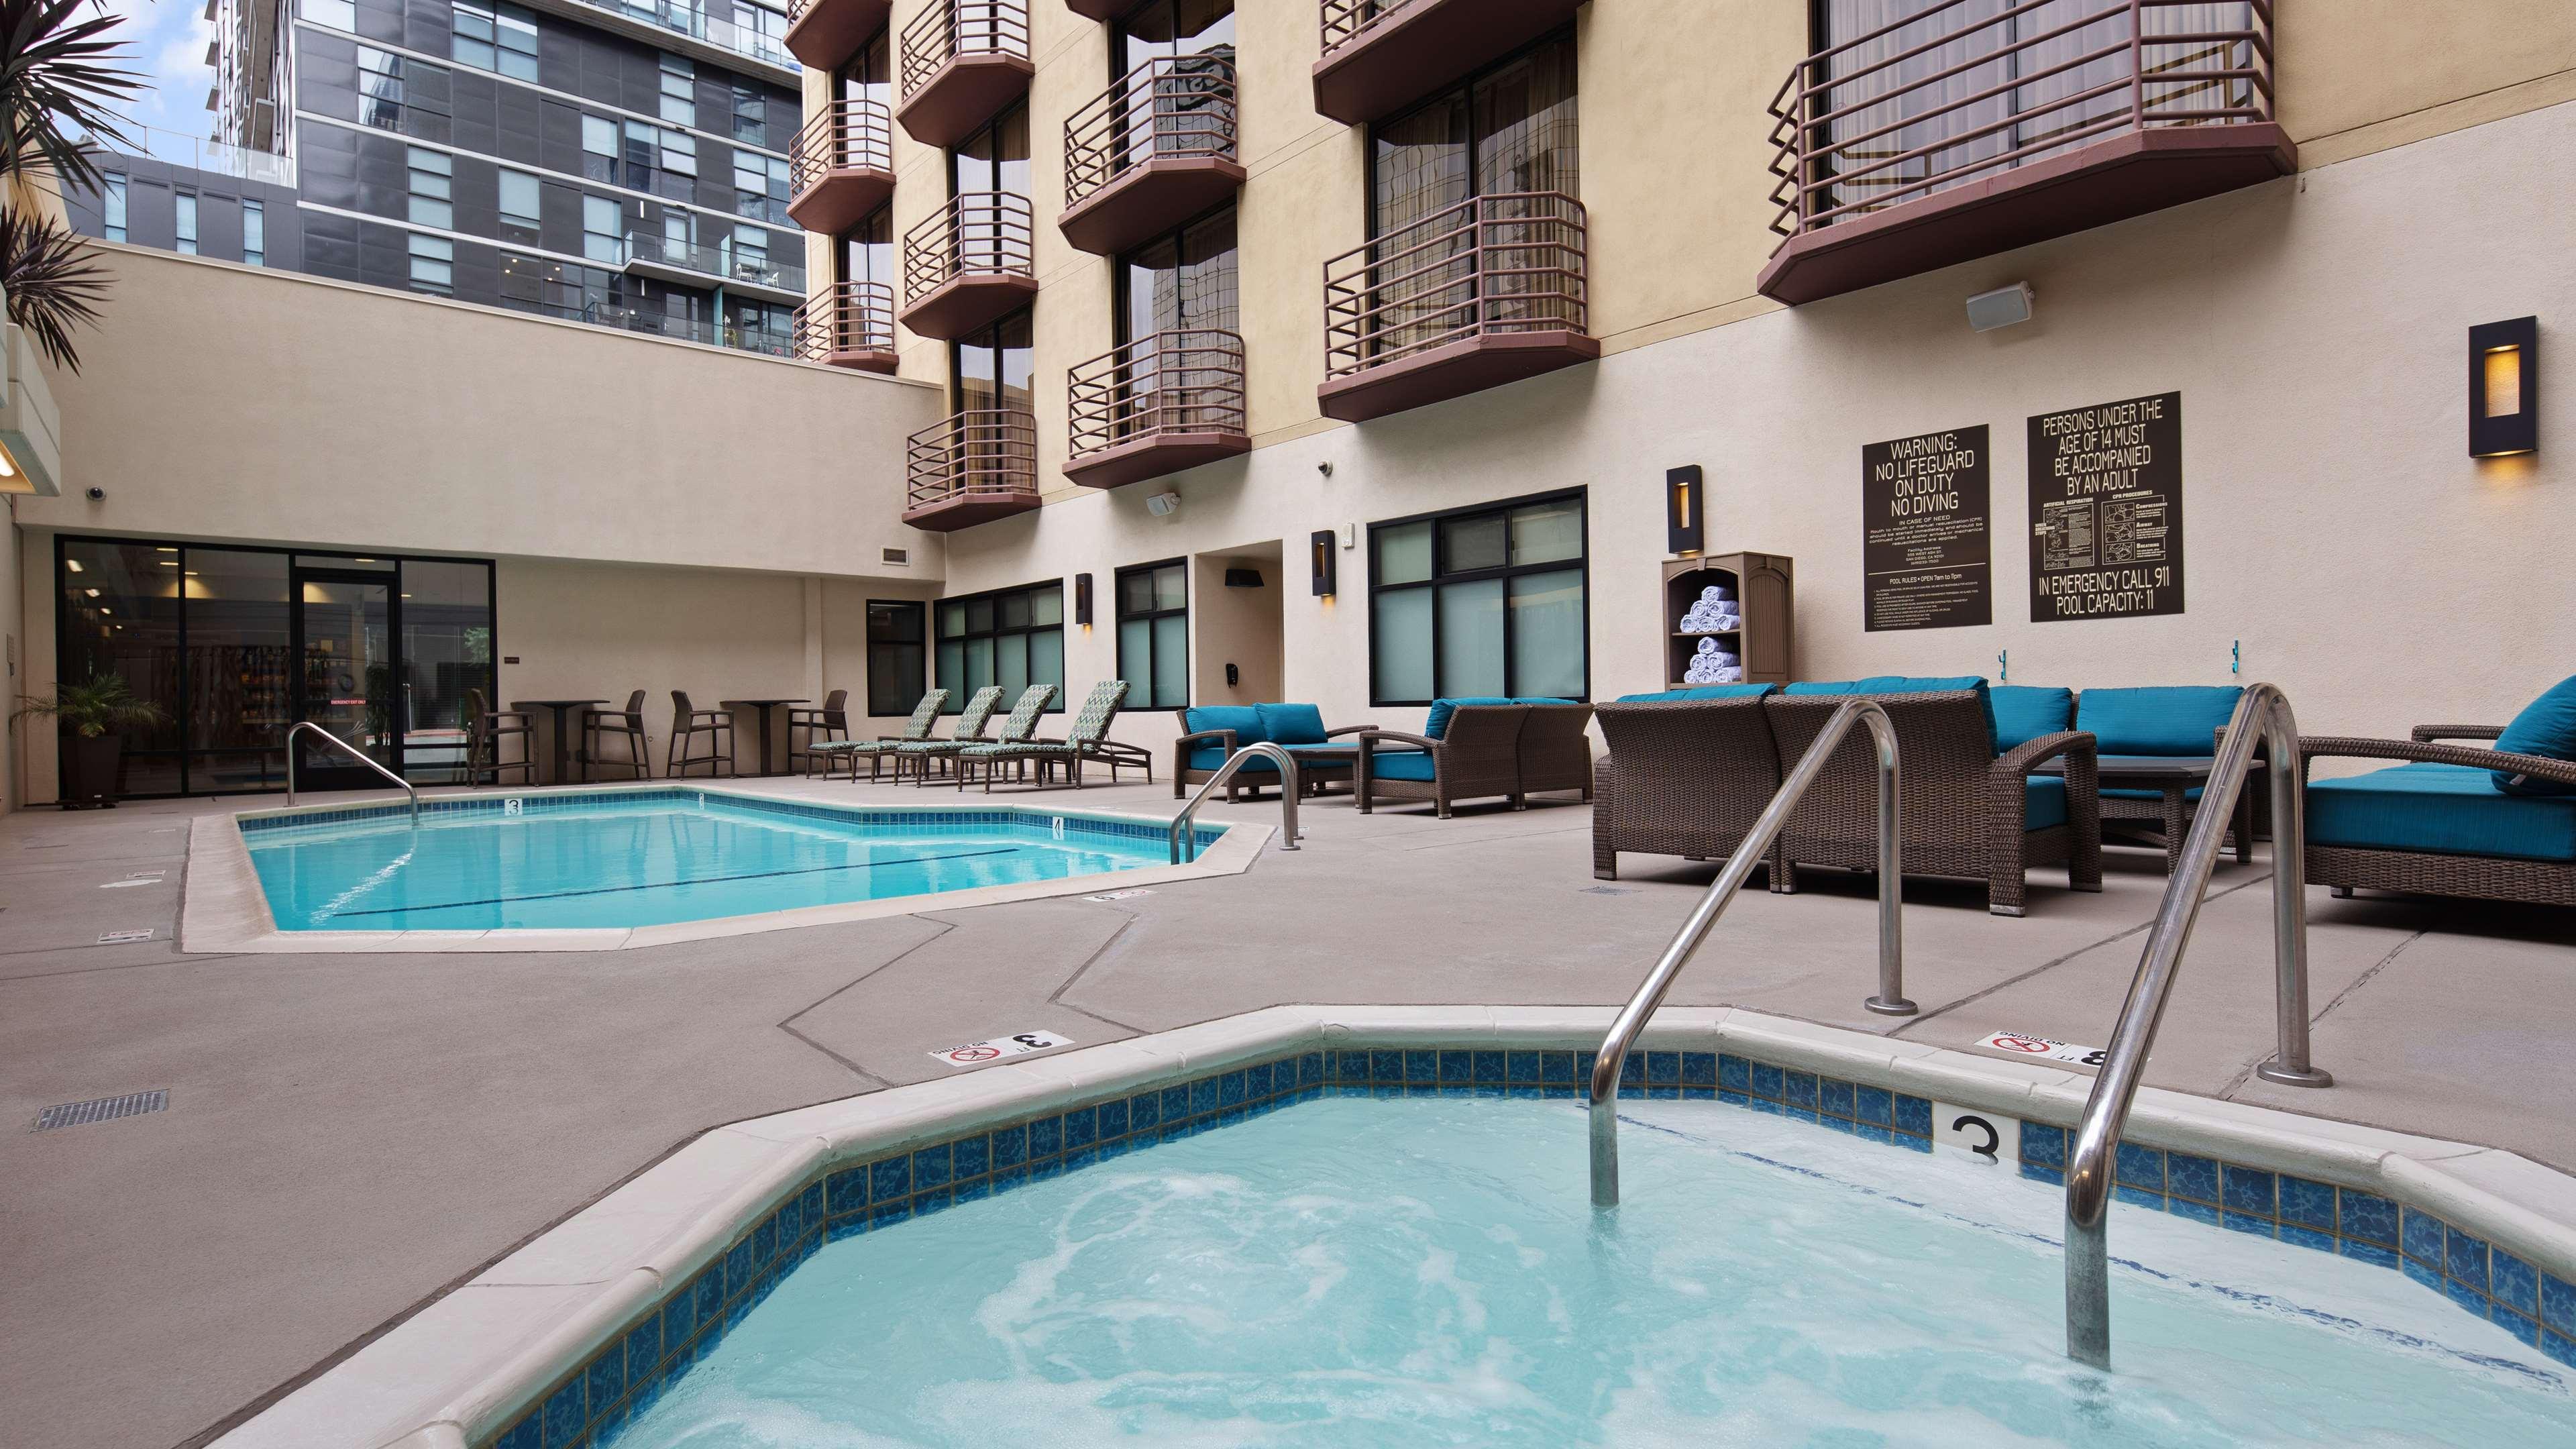 Outdoor Pool & Hot Tub Area